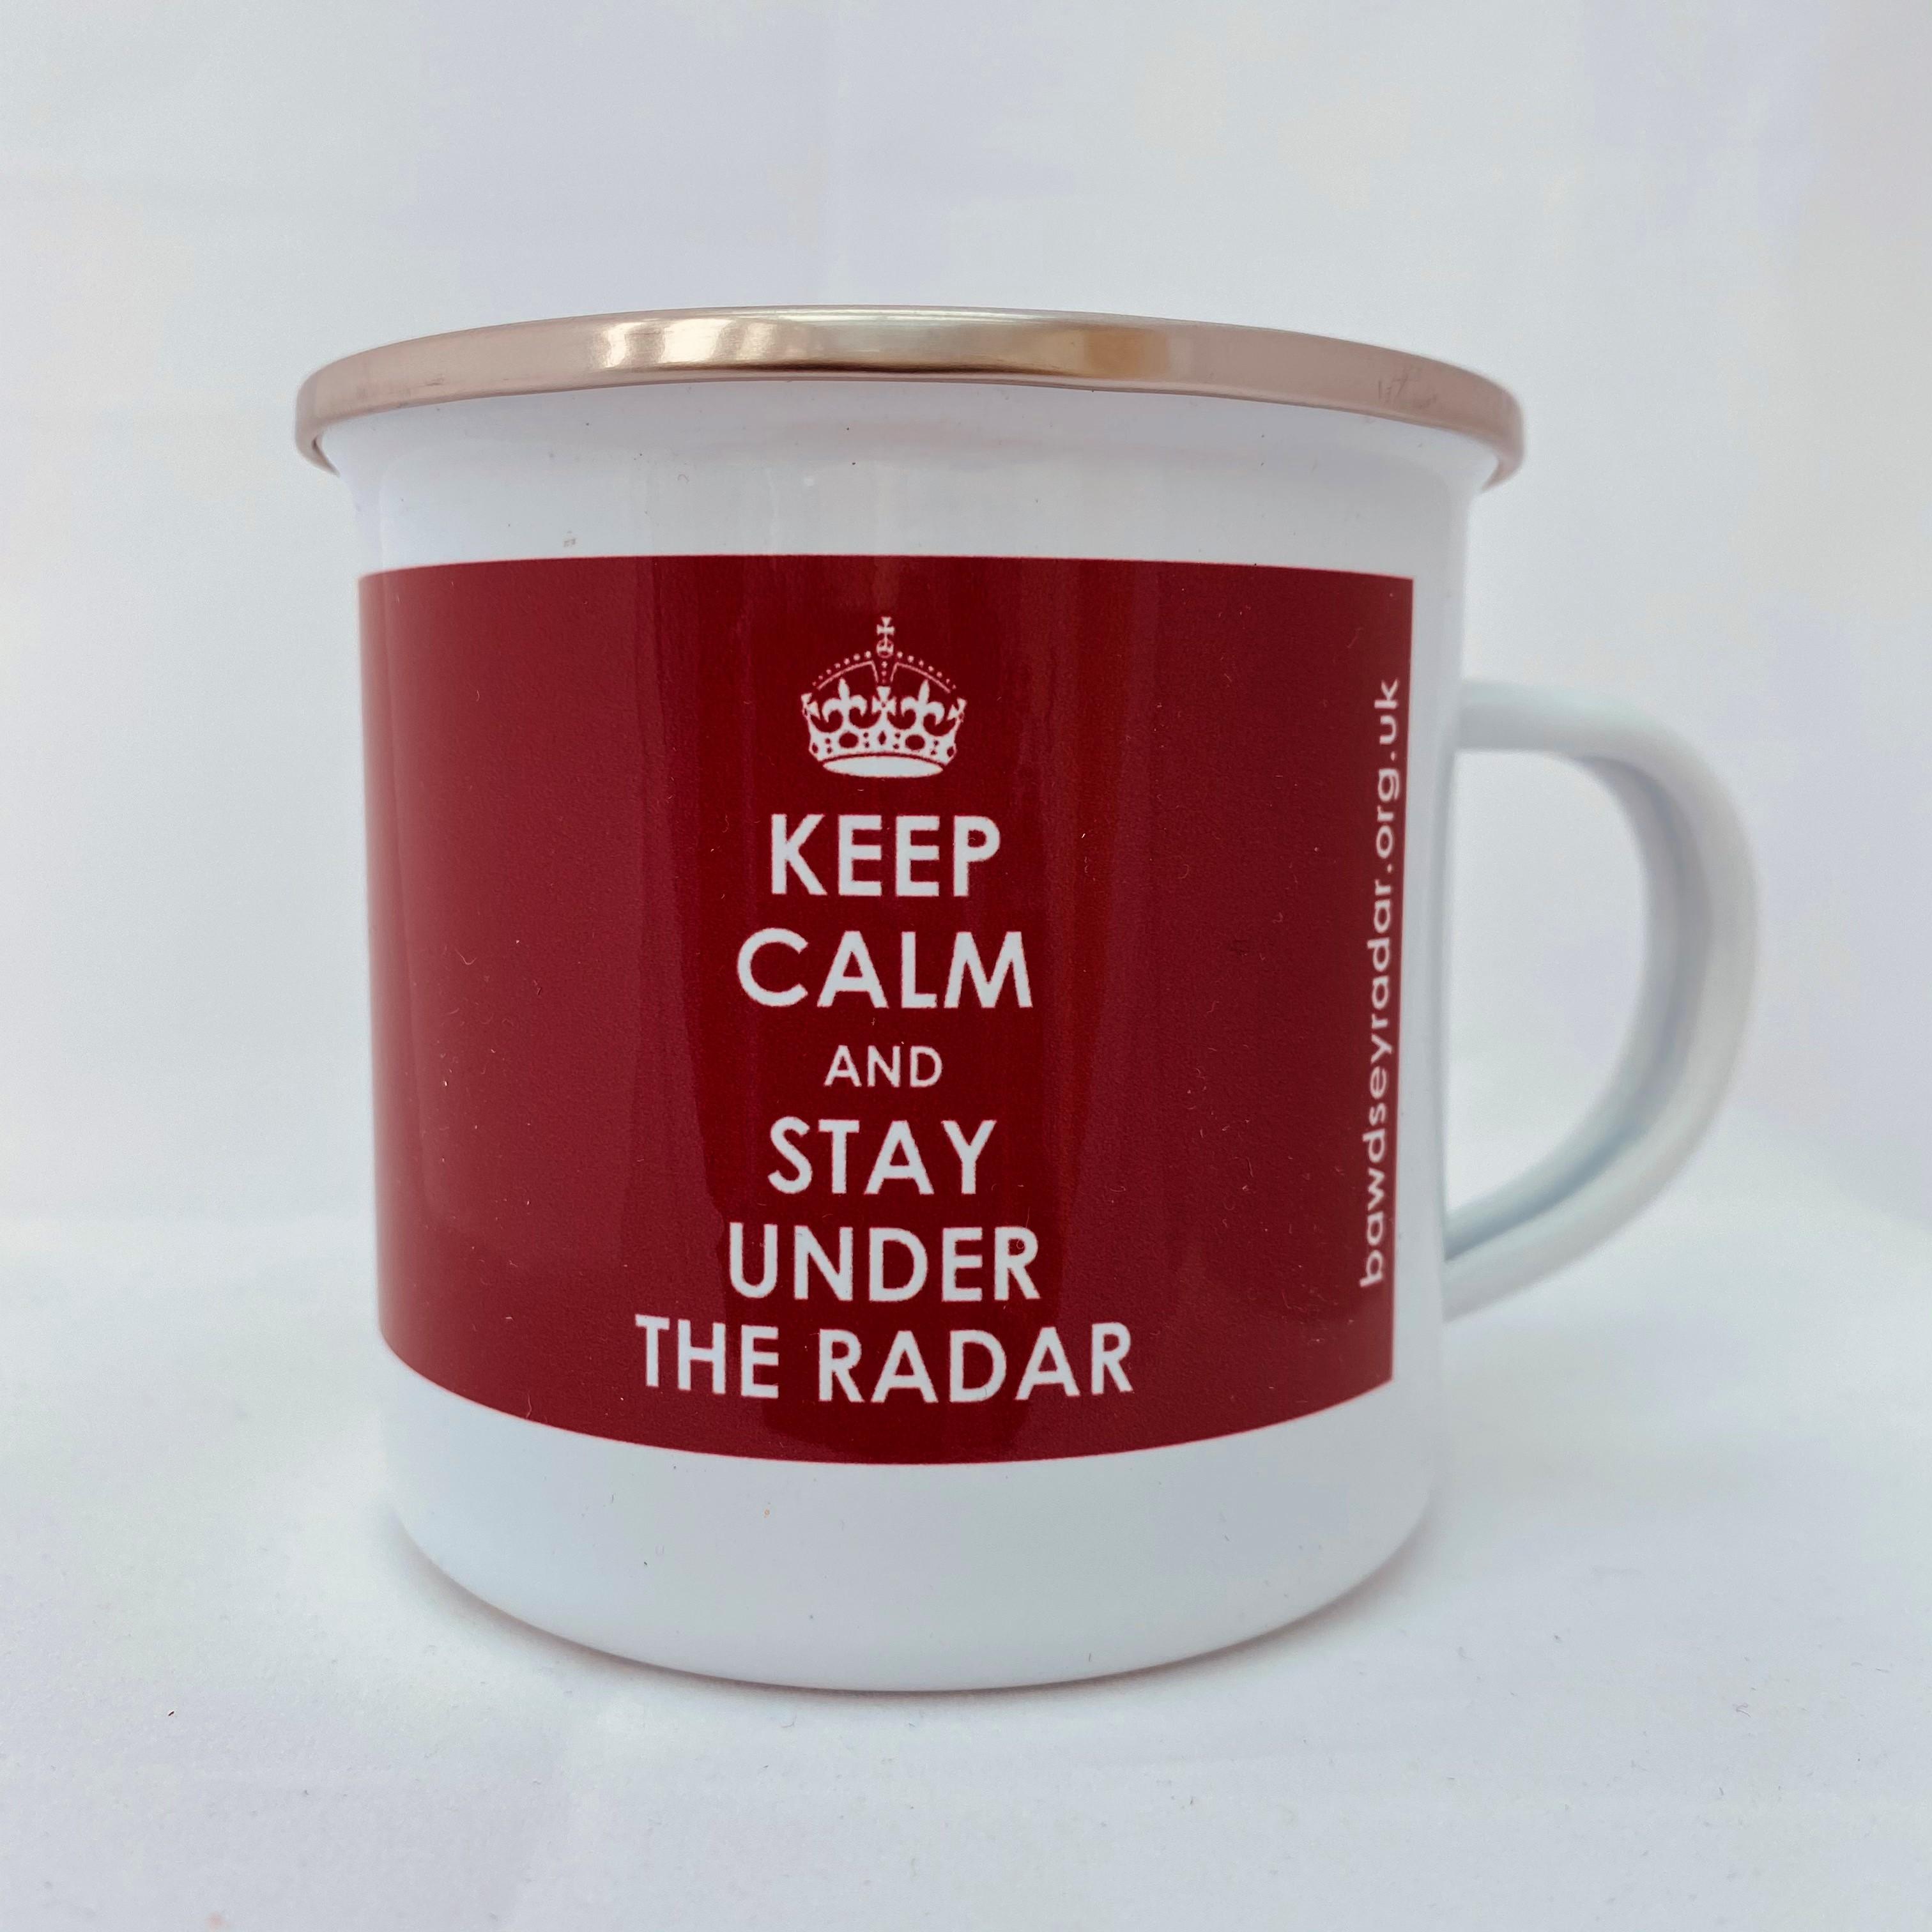 KEEP CALM Enamel Mug